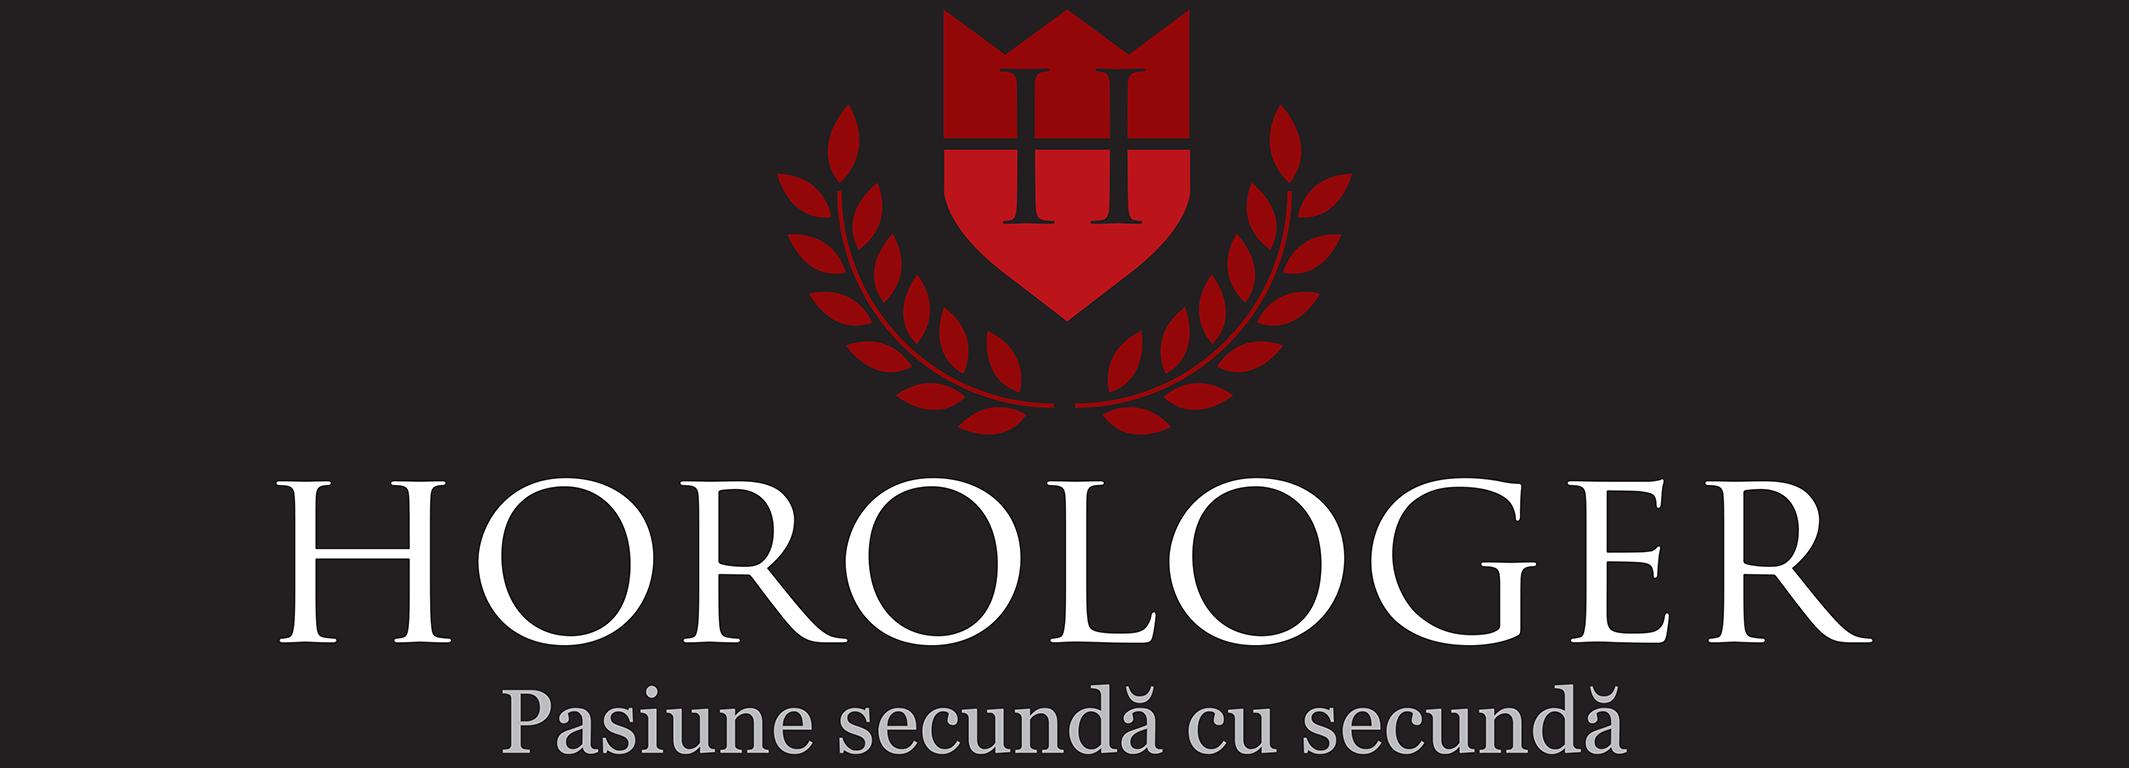 Horologer